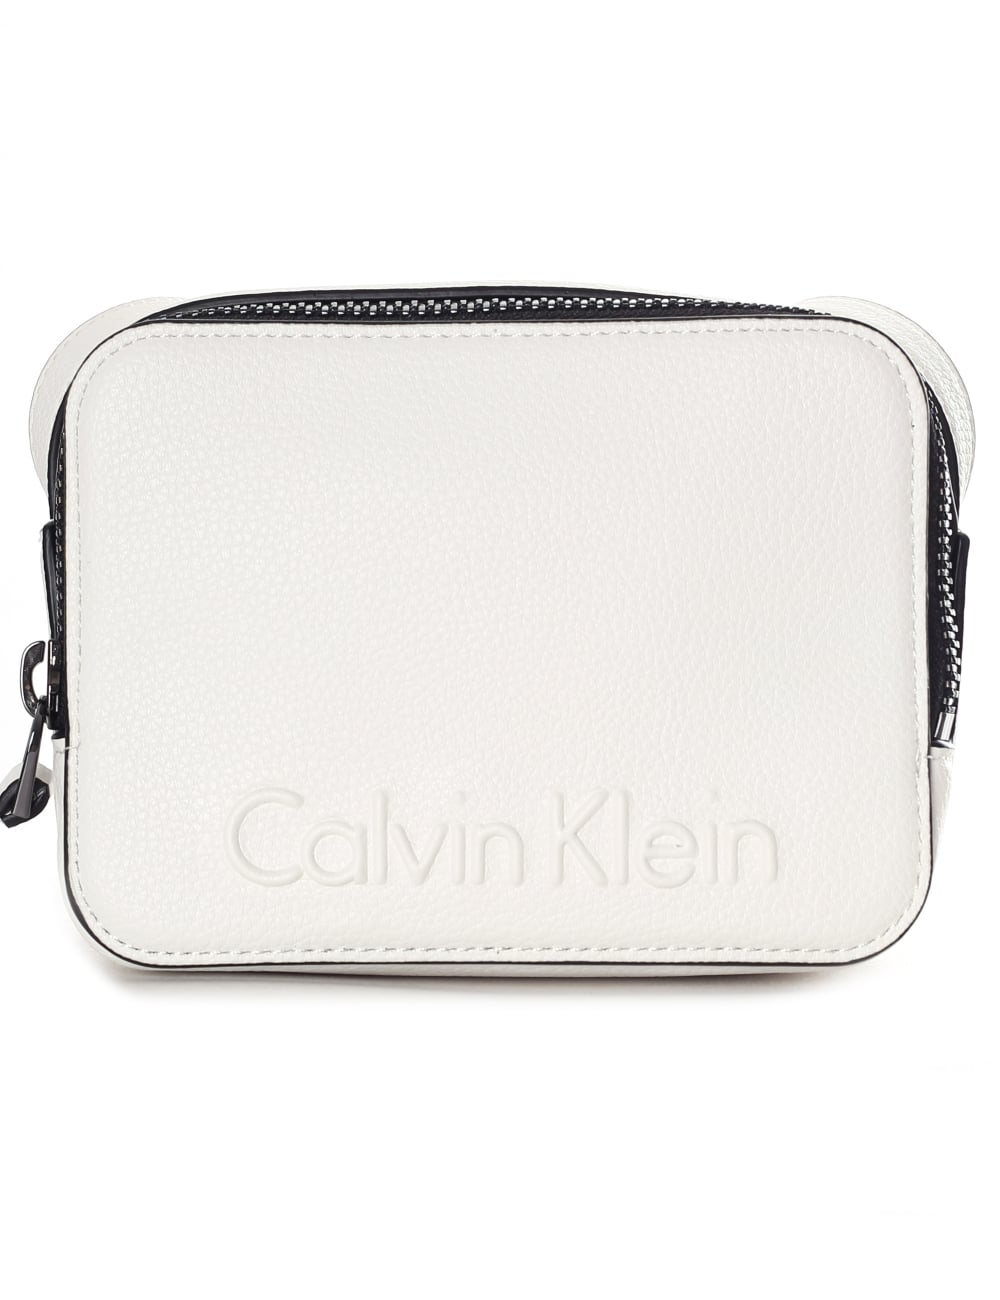 5302fd768801 Calvin Klein Women's Embossed Small Crossbody Bag